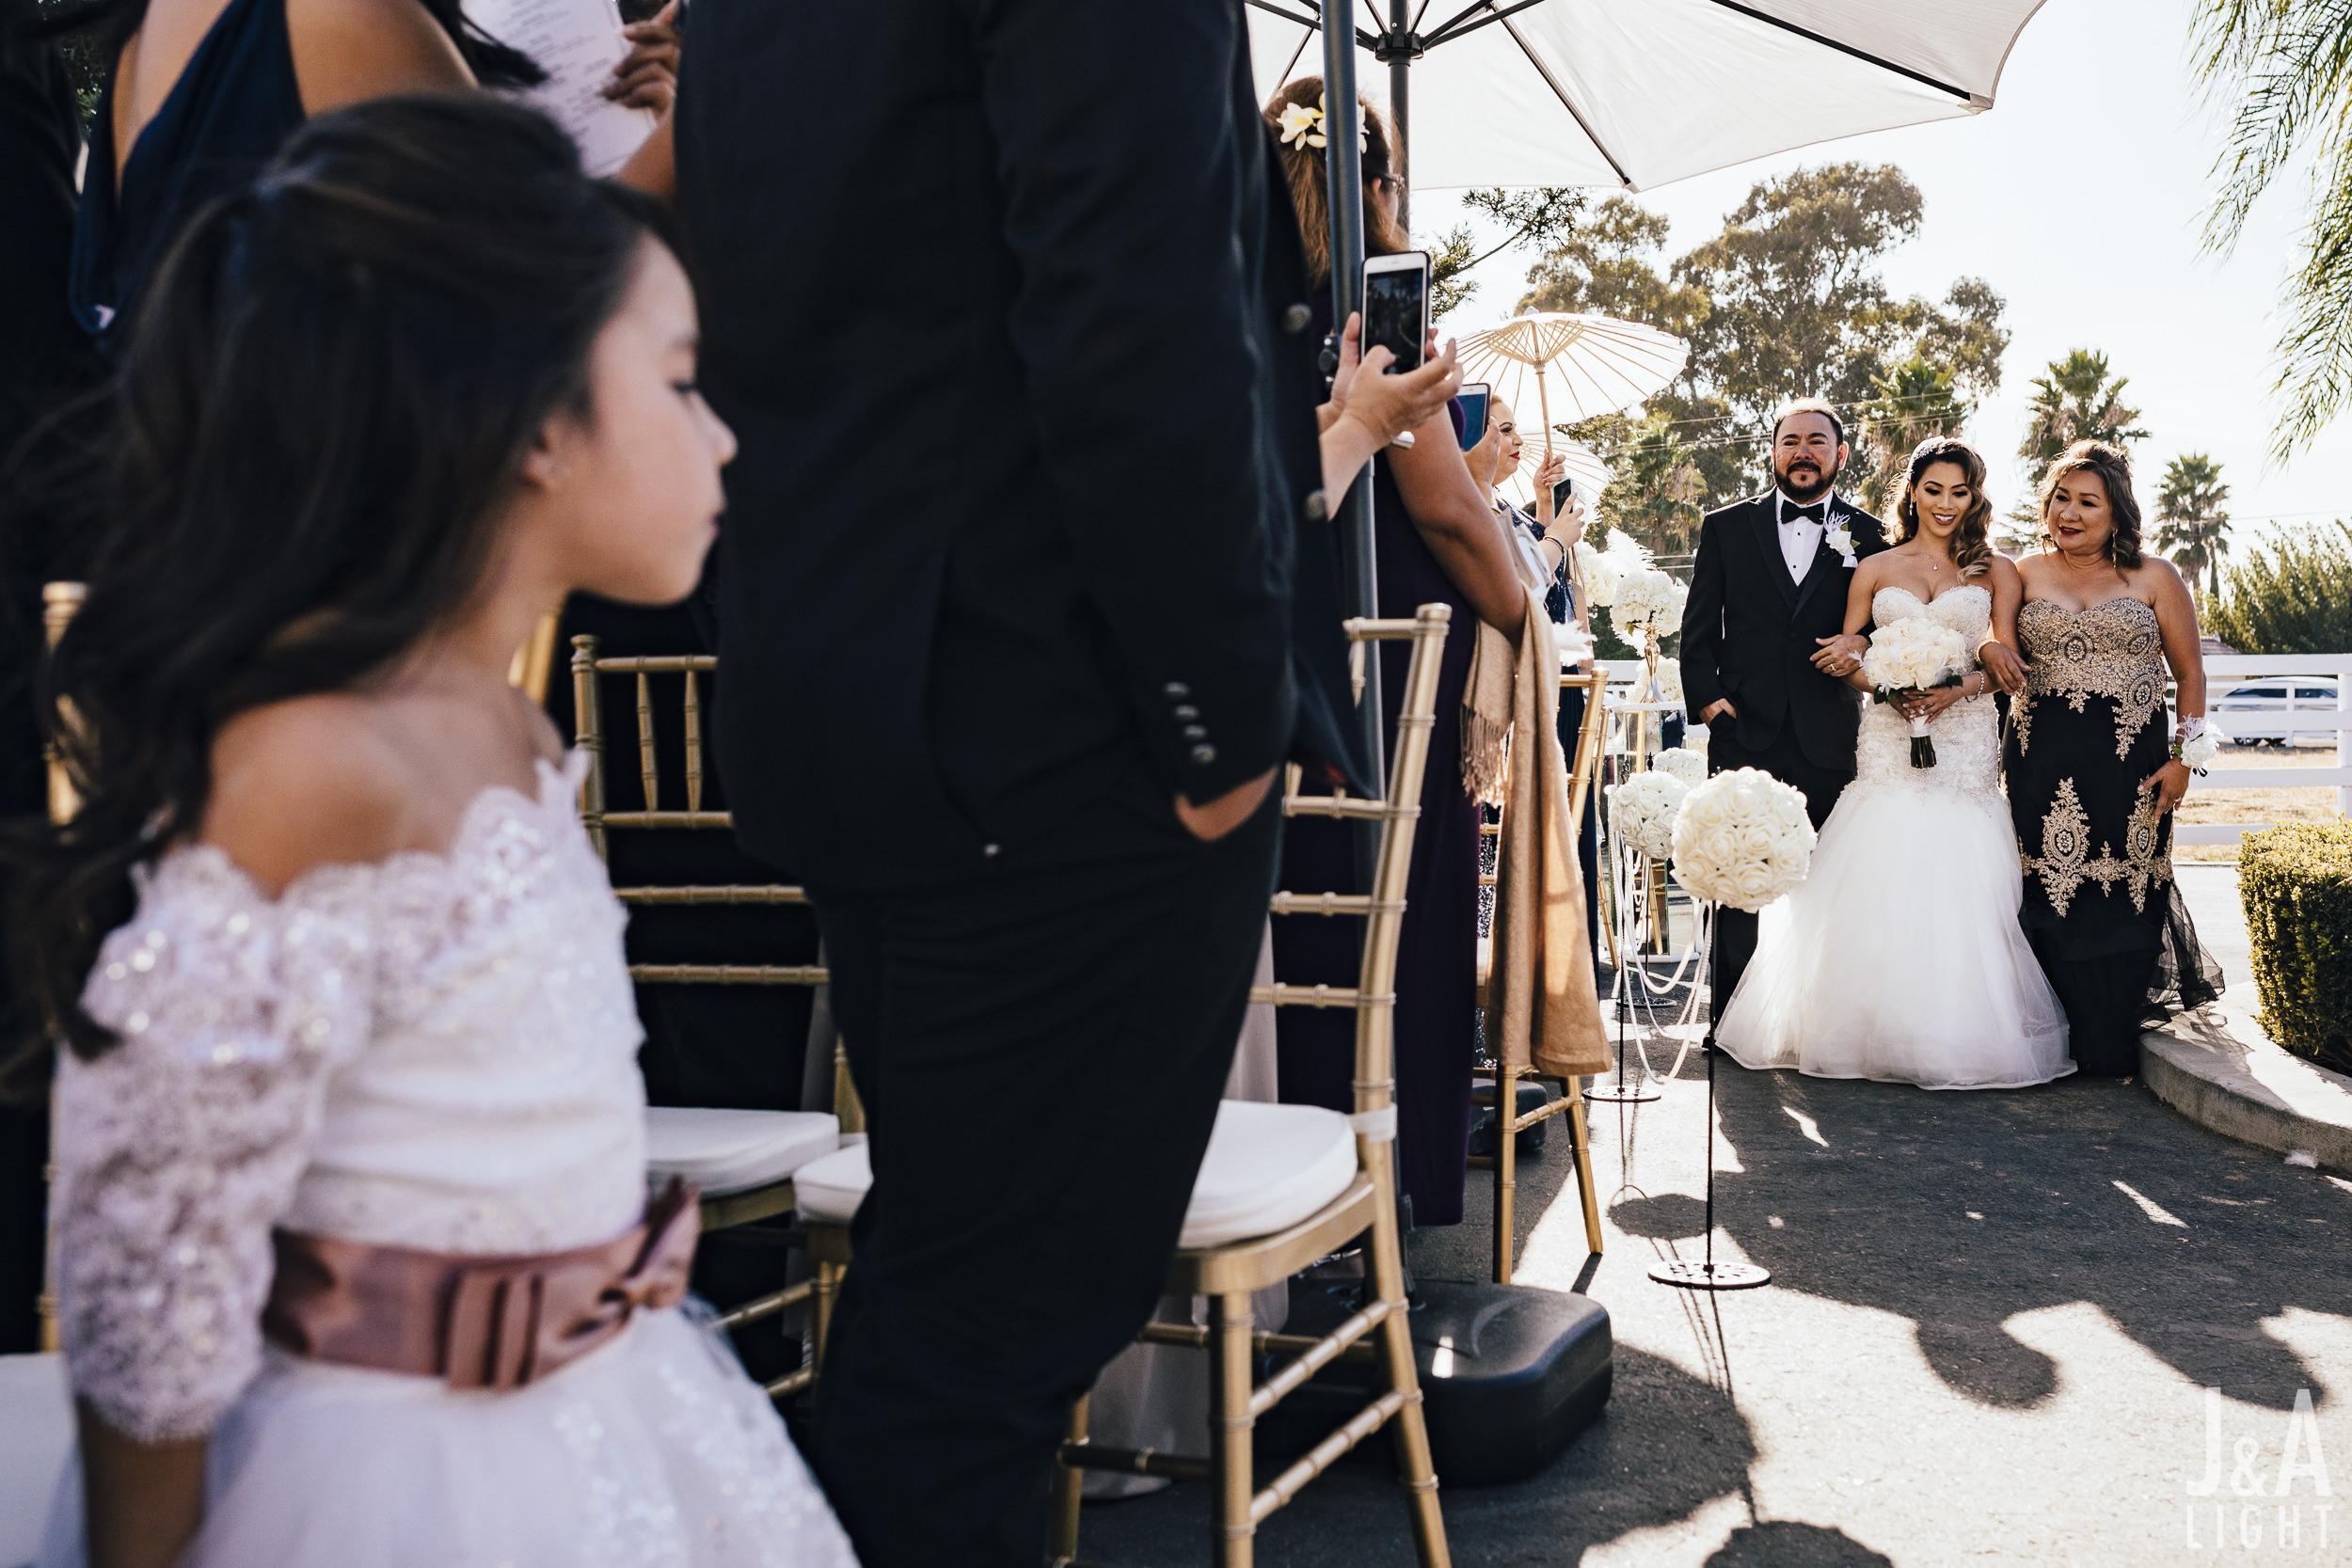 20171014-JanDan-LosBanos-GlassMansion-Wedding-Blog-034.jpg